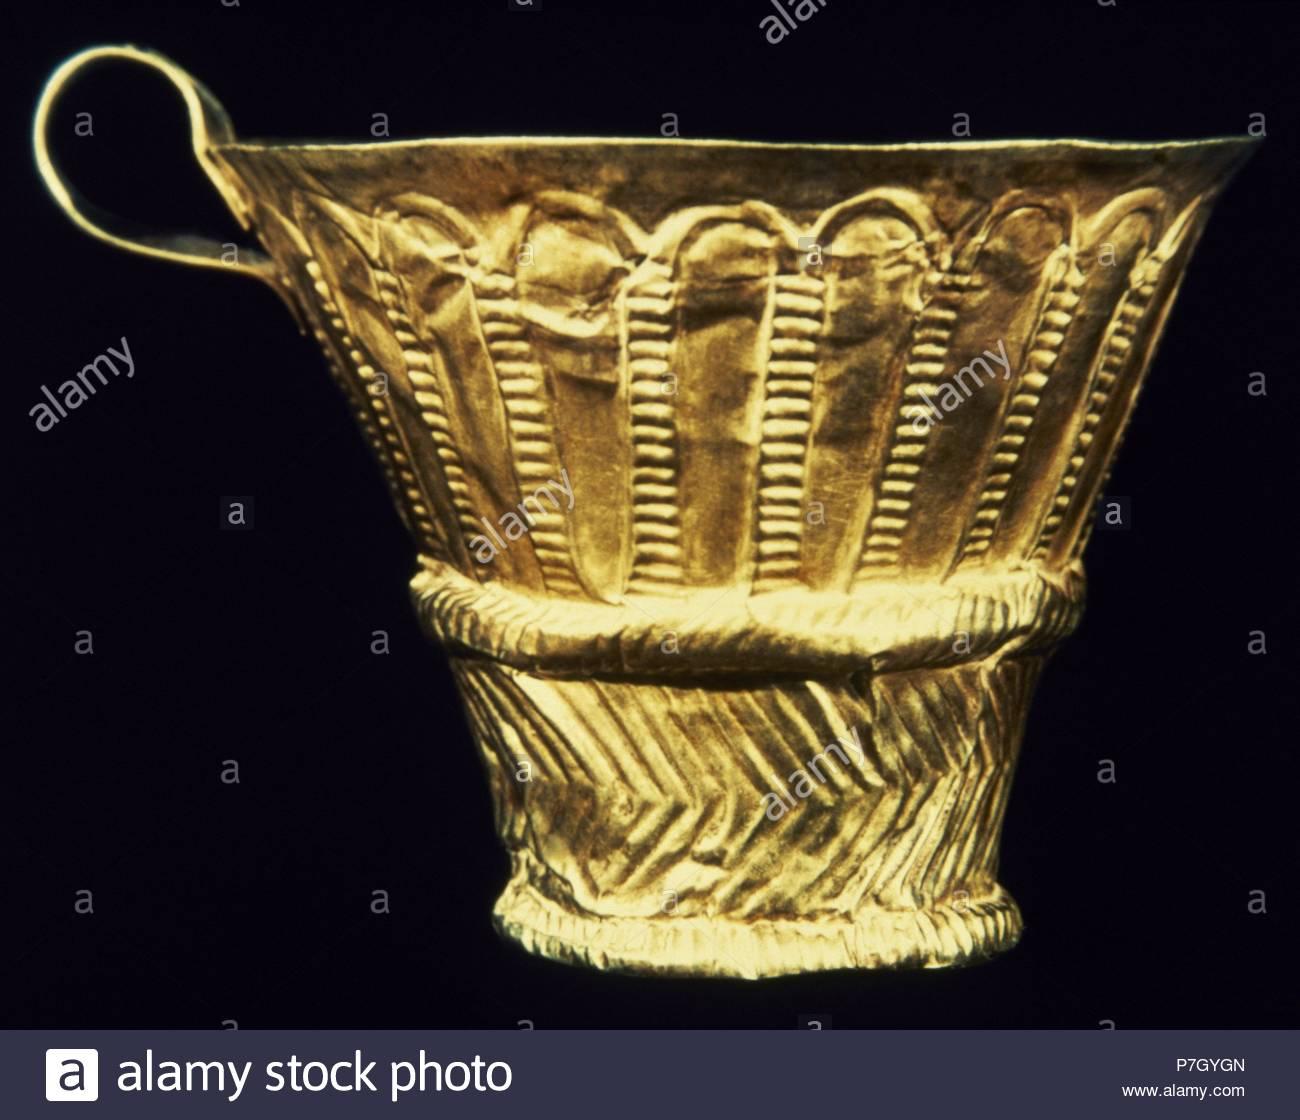 copa oro stock photos & copa oro stock images - alamy